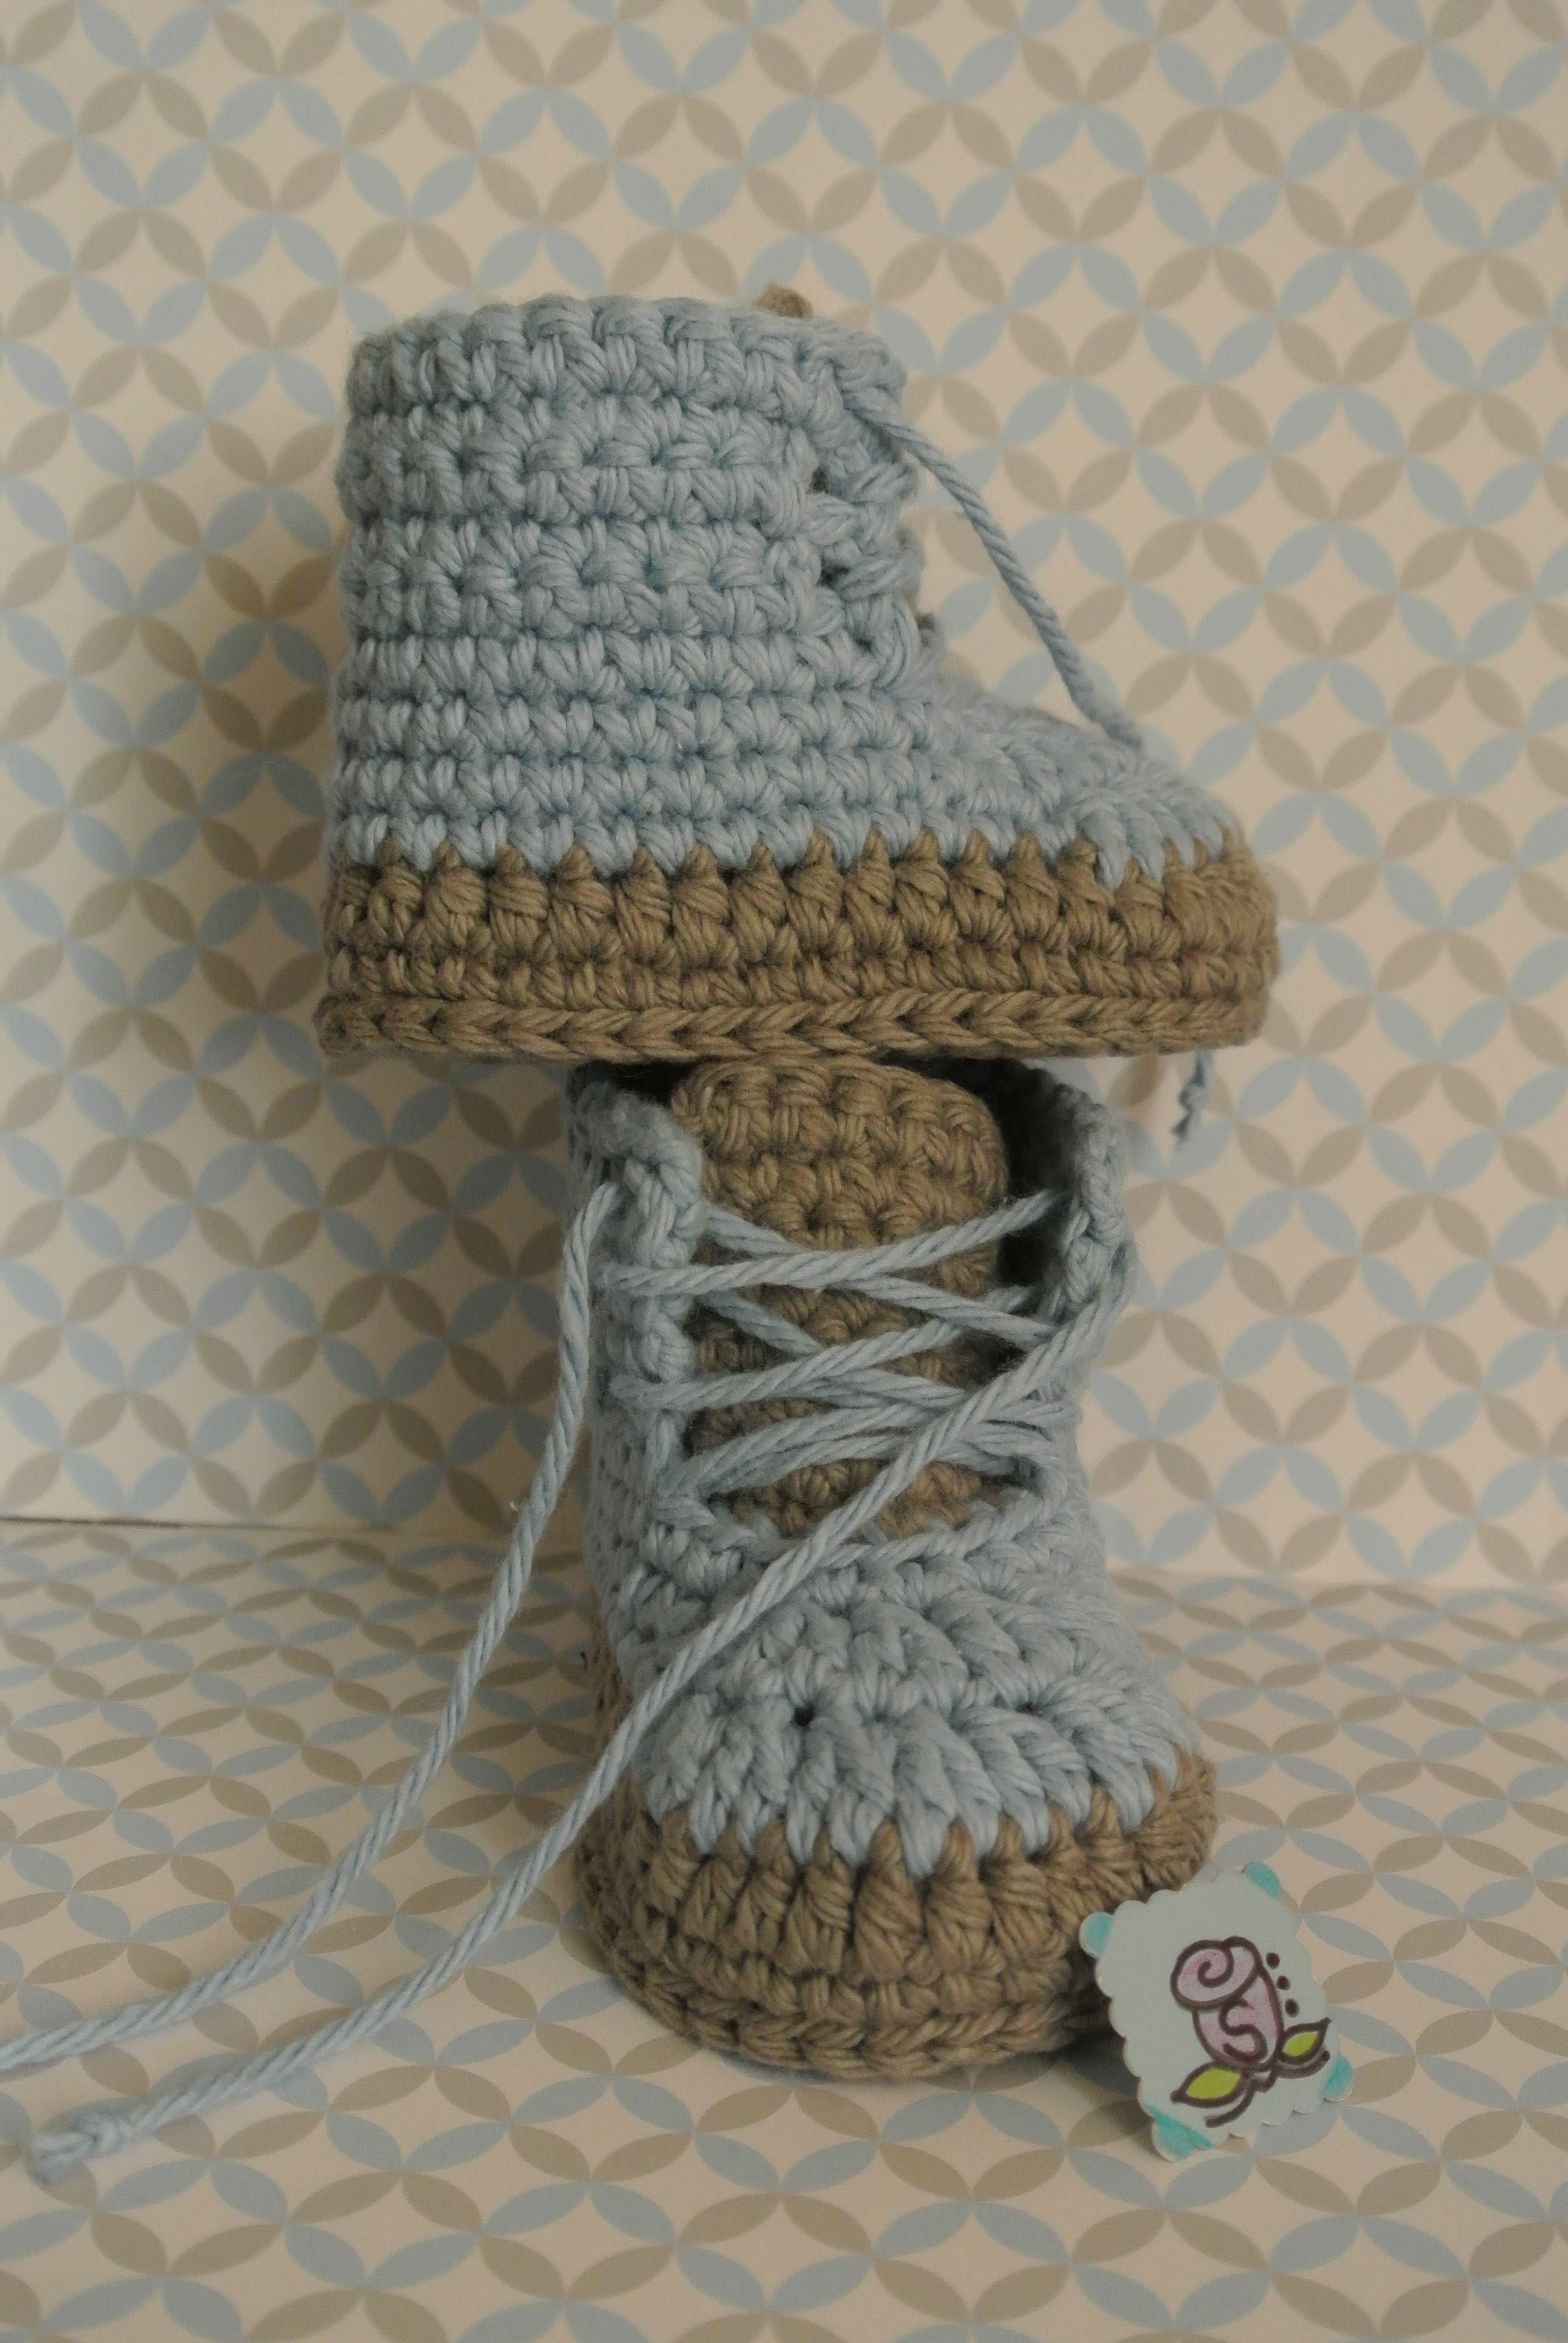 Crochet Baby Boy Shoes Made By Me.....Zapatito de Bebe a Crochet ...